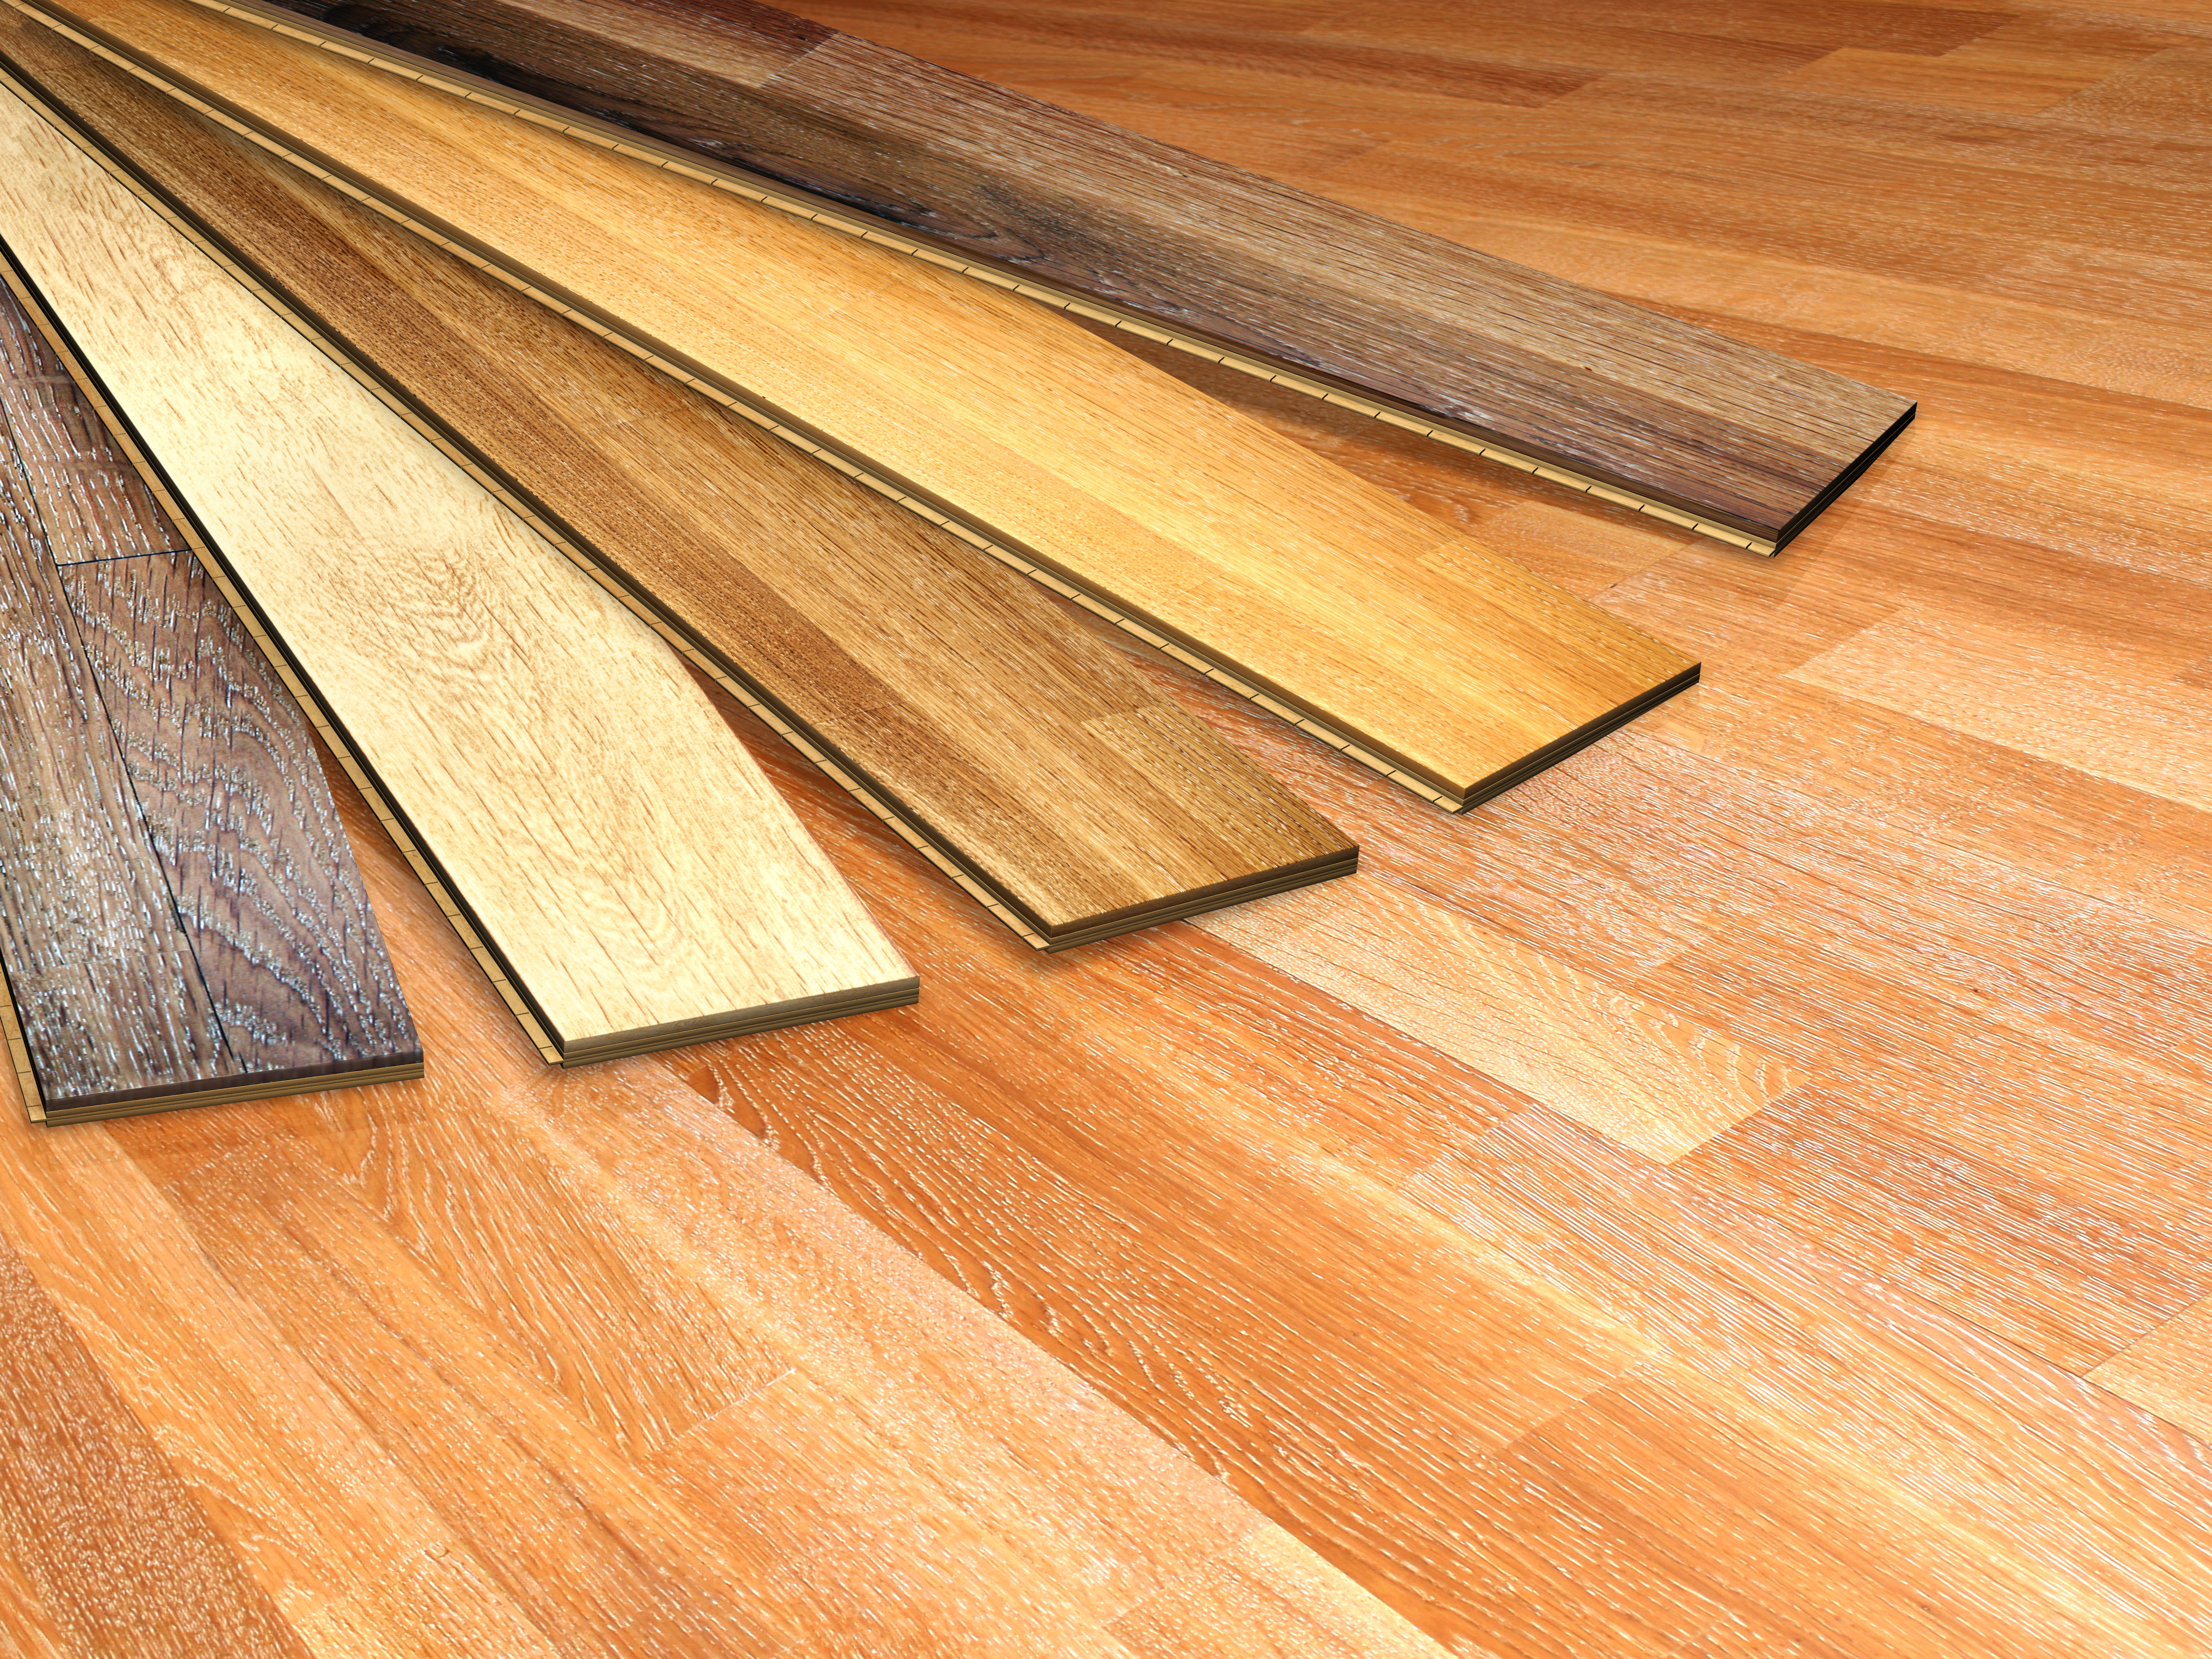 Hardwood floor choices in Berea